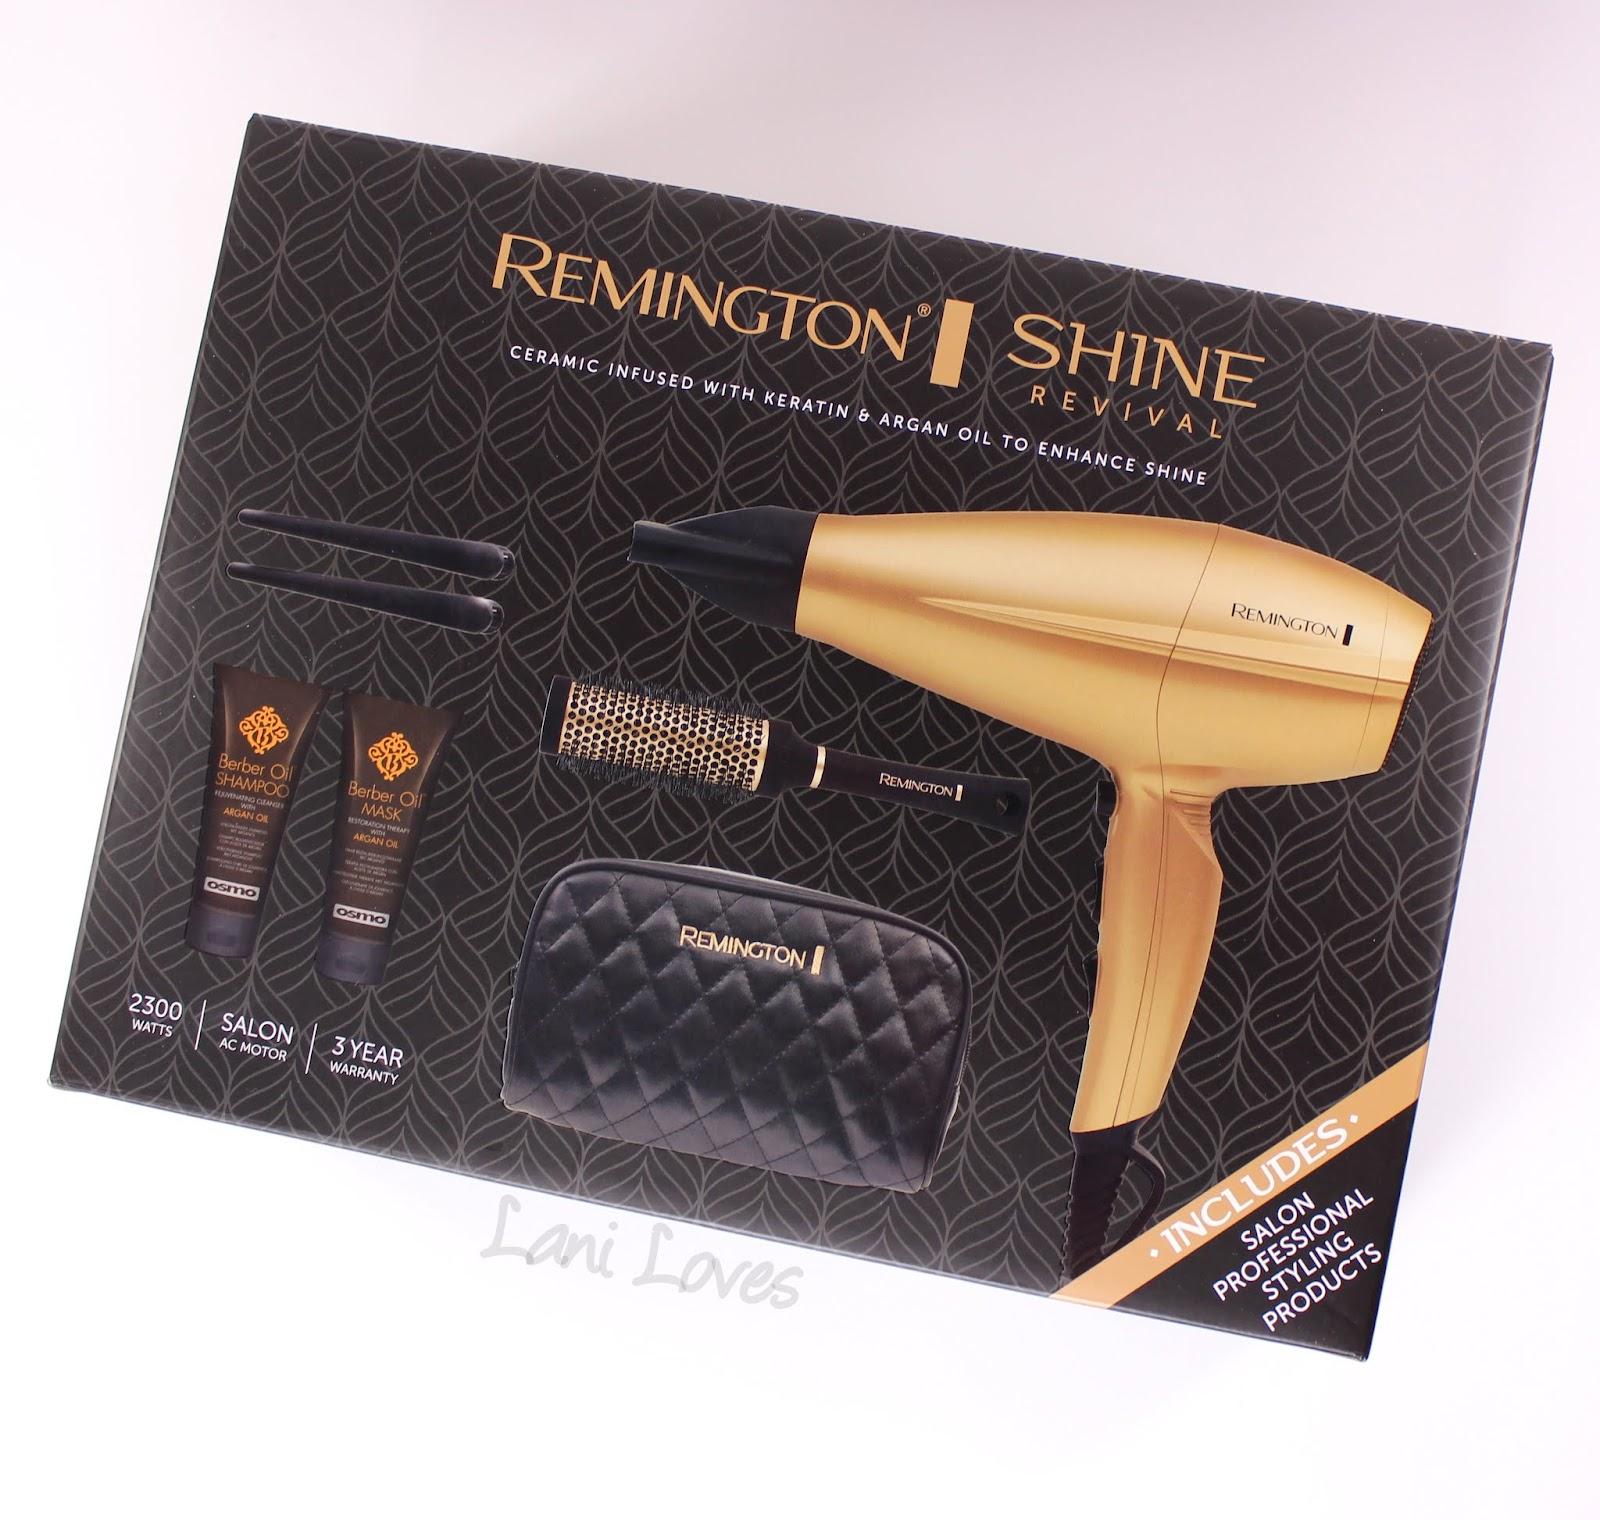 remington diamond shine hair dryer reviews